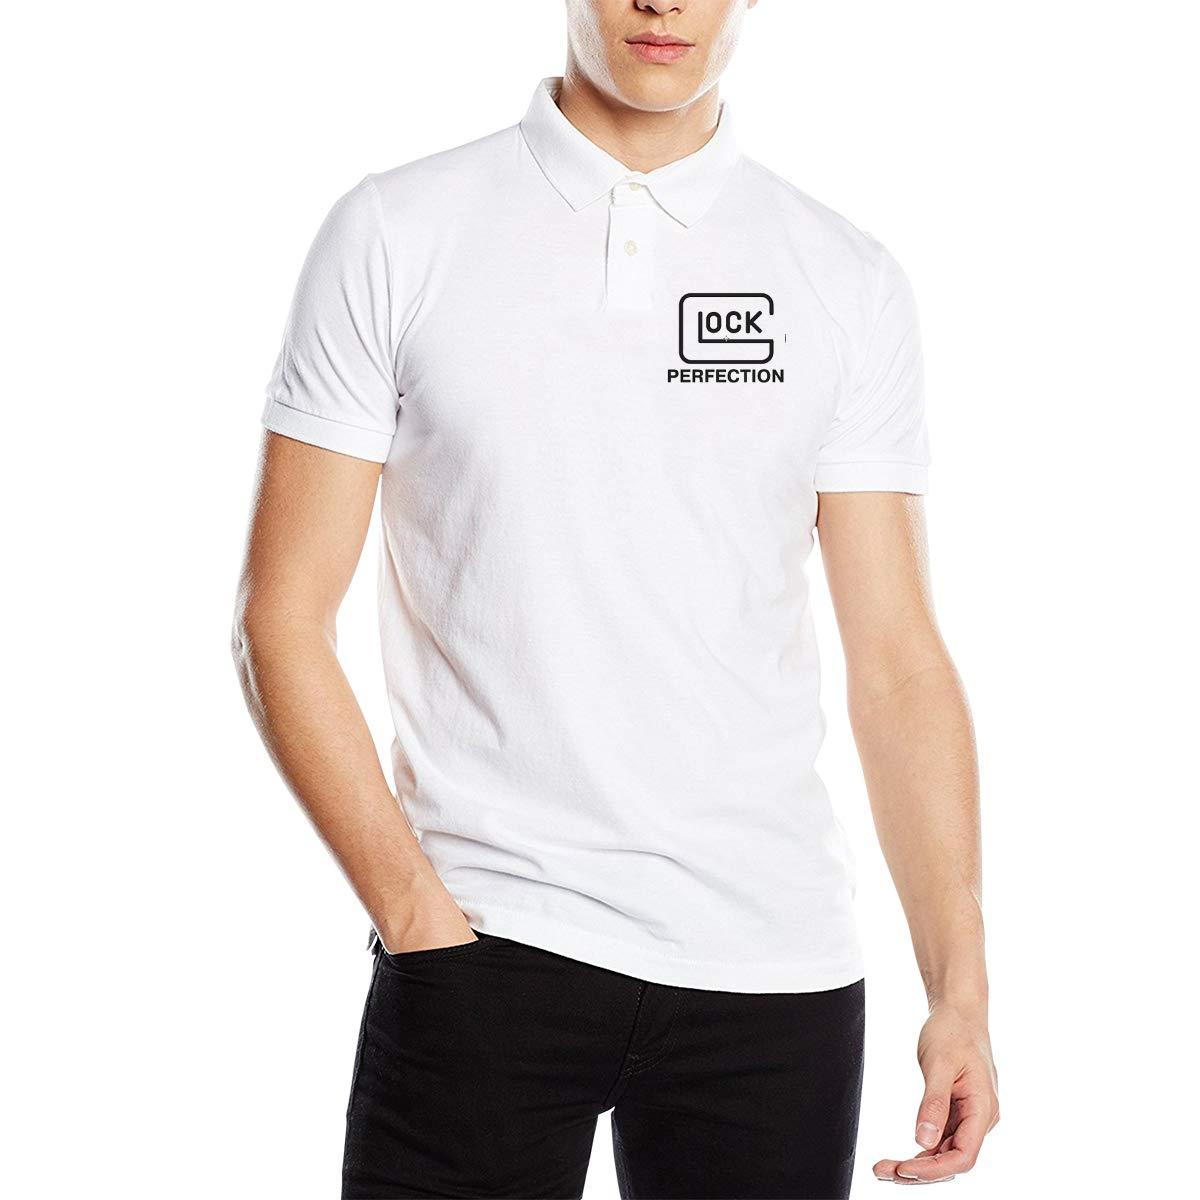 UP LUCK Glock OEM Parts Mens Premium Office Polo Shirt: Amazon.es ...